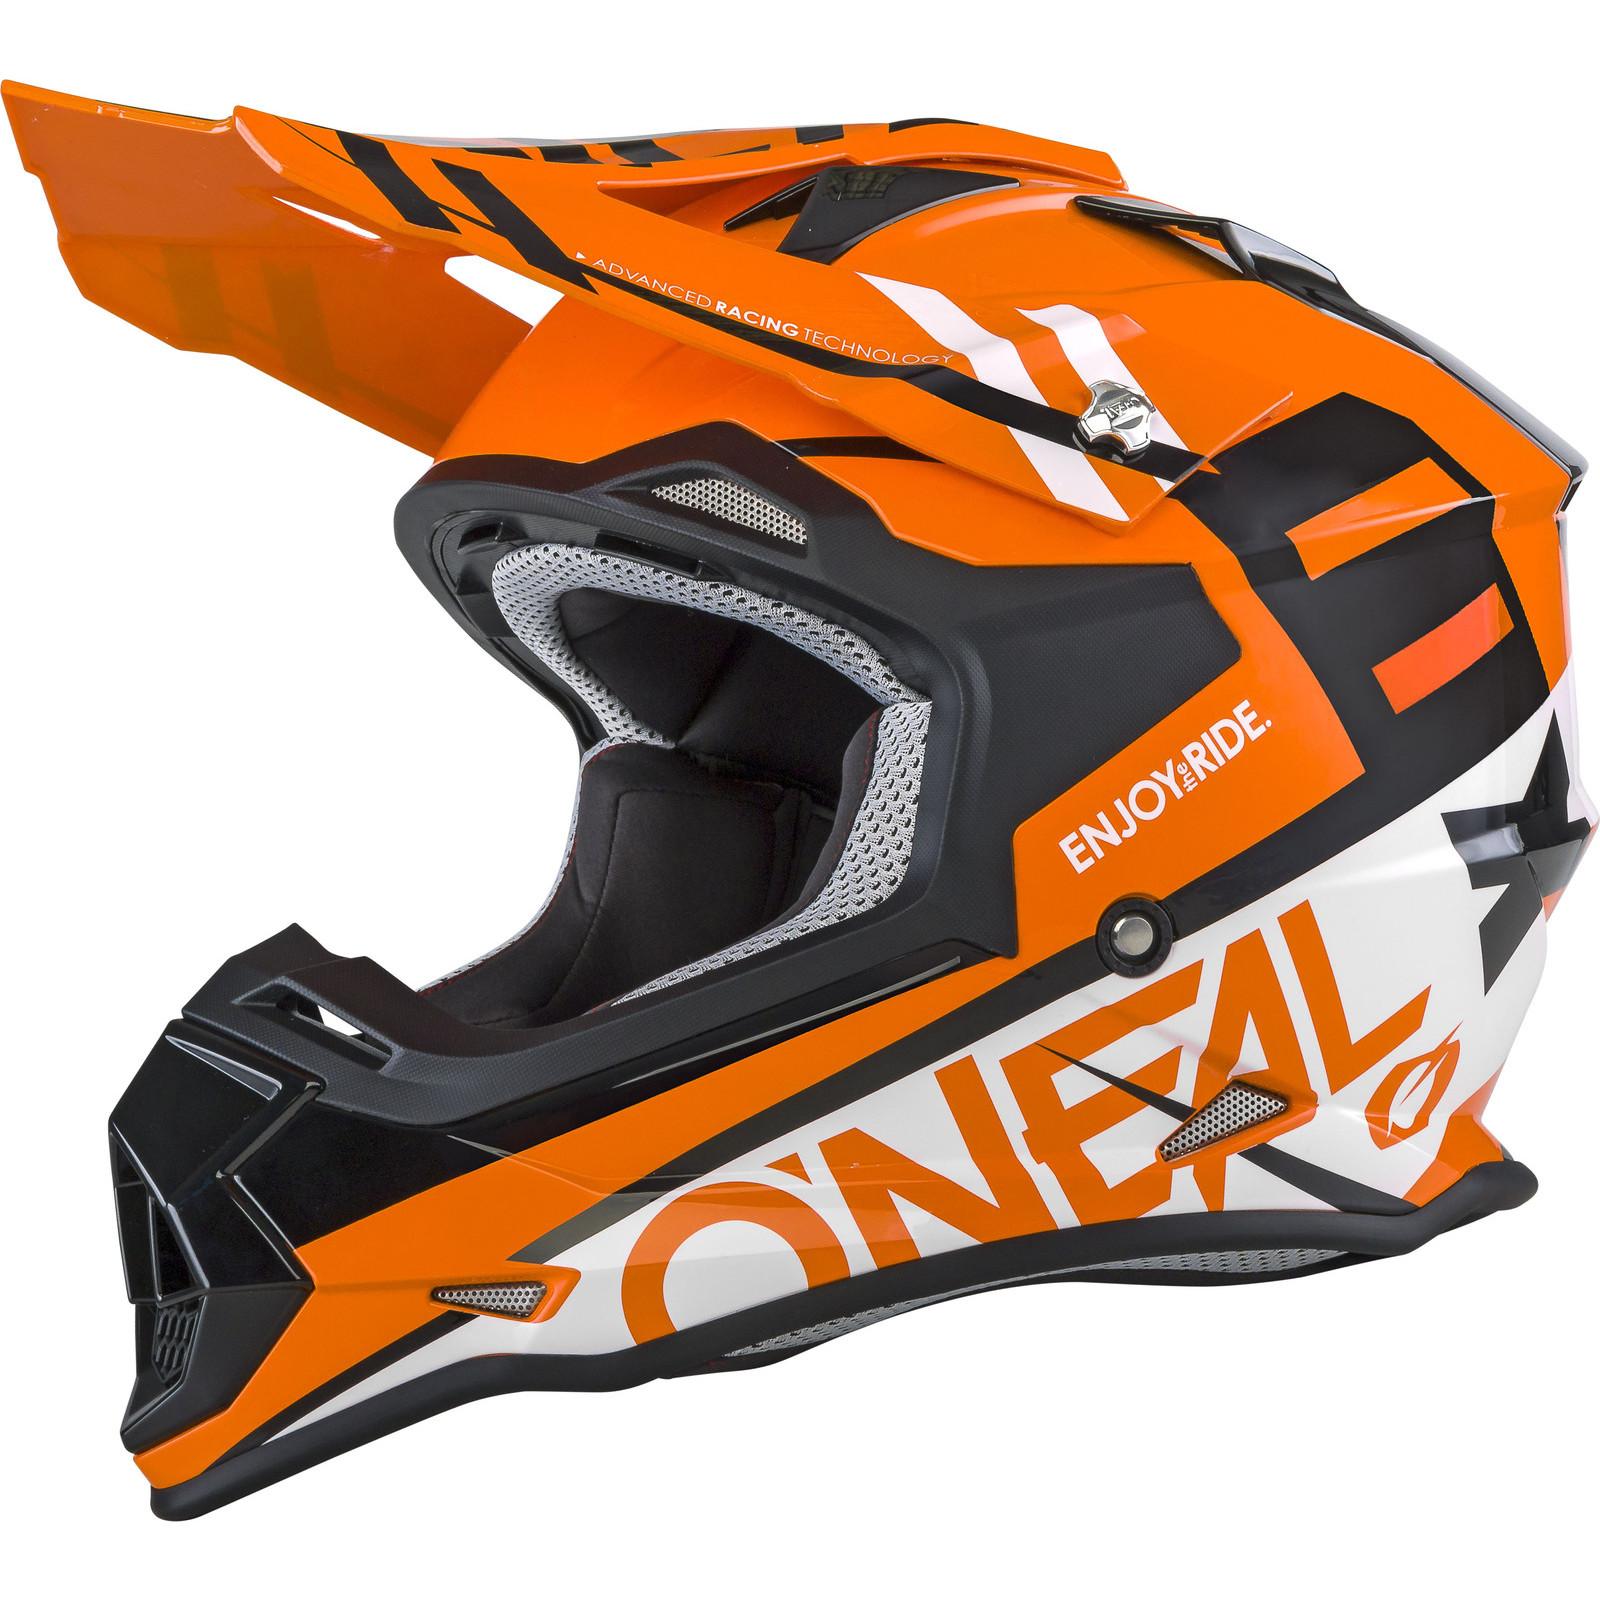 oneal 2 series rl spyde motocross helmet enduro adventure off road dirt bike mx ebay. Black Bedroom Furniture Sets. Home Design Ideas